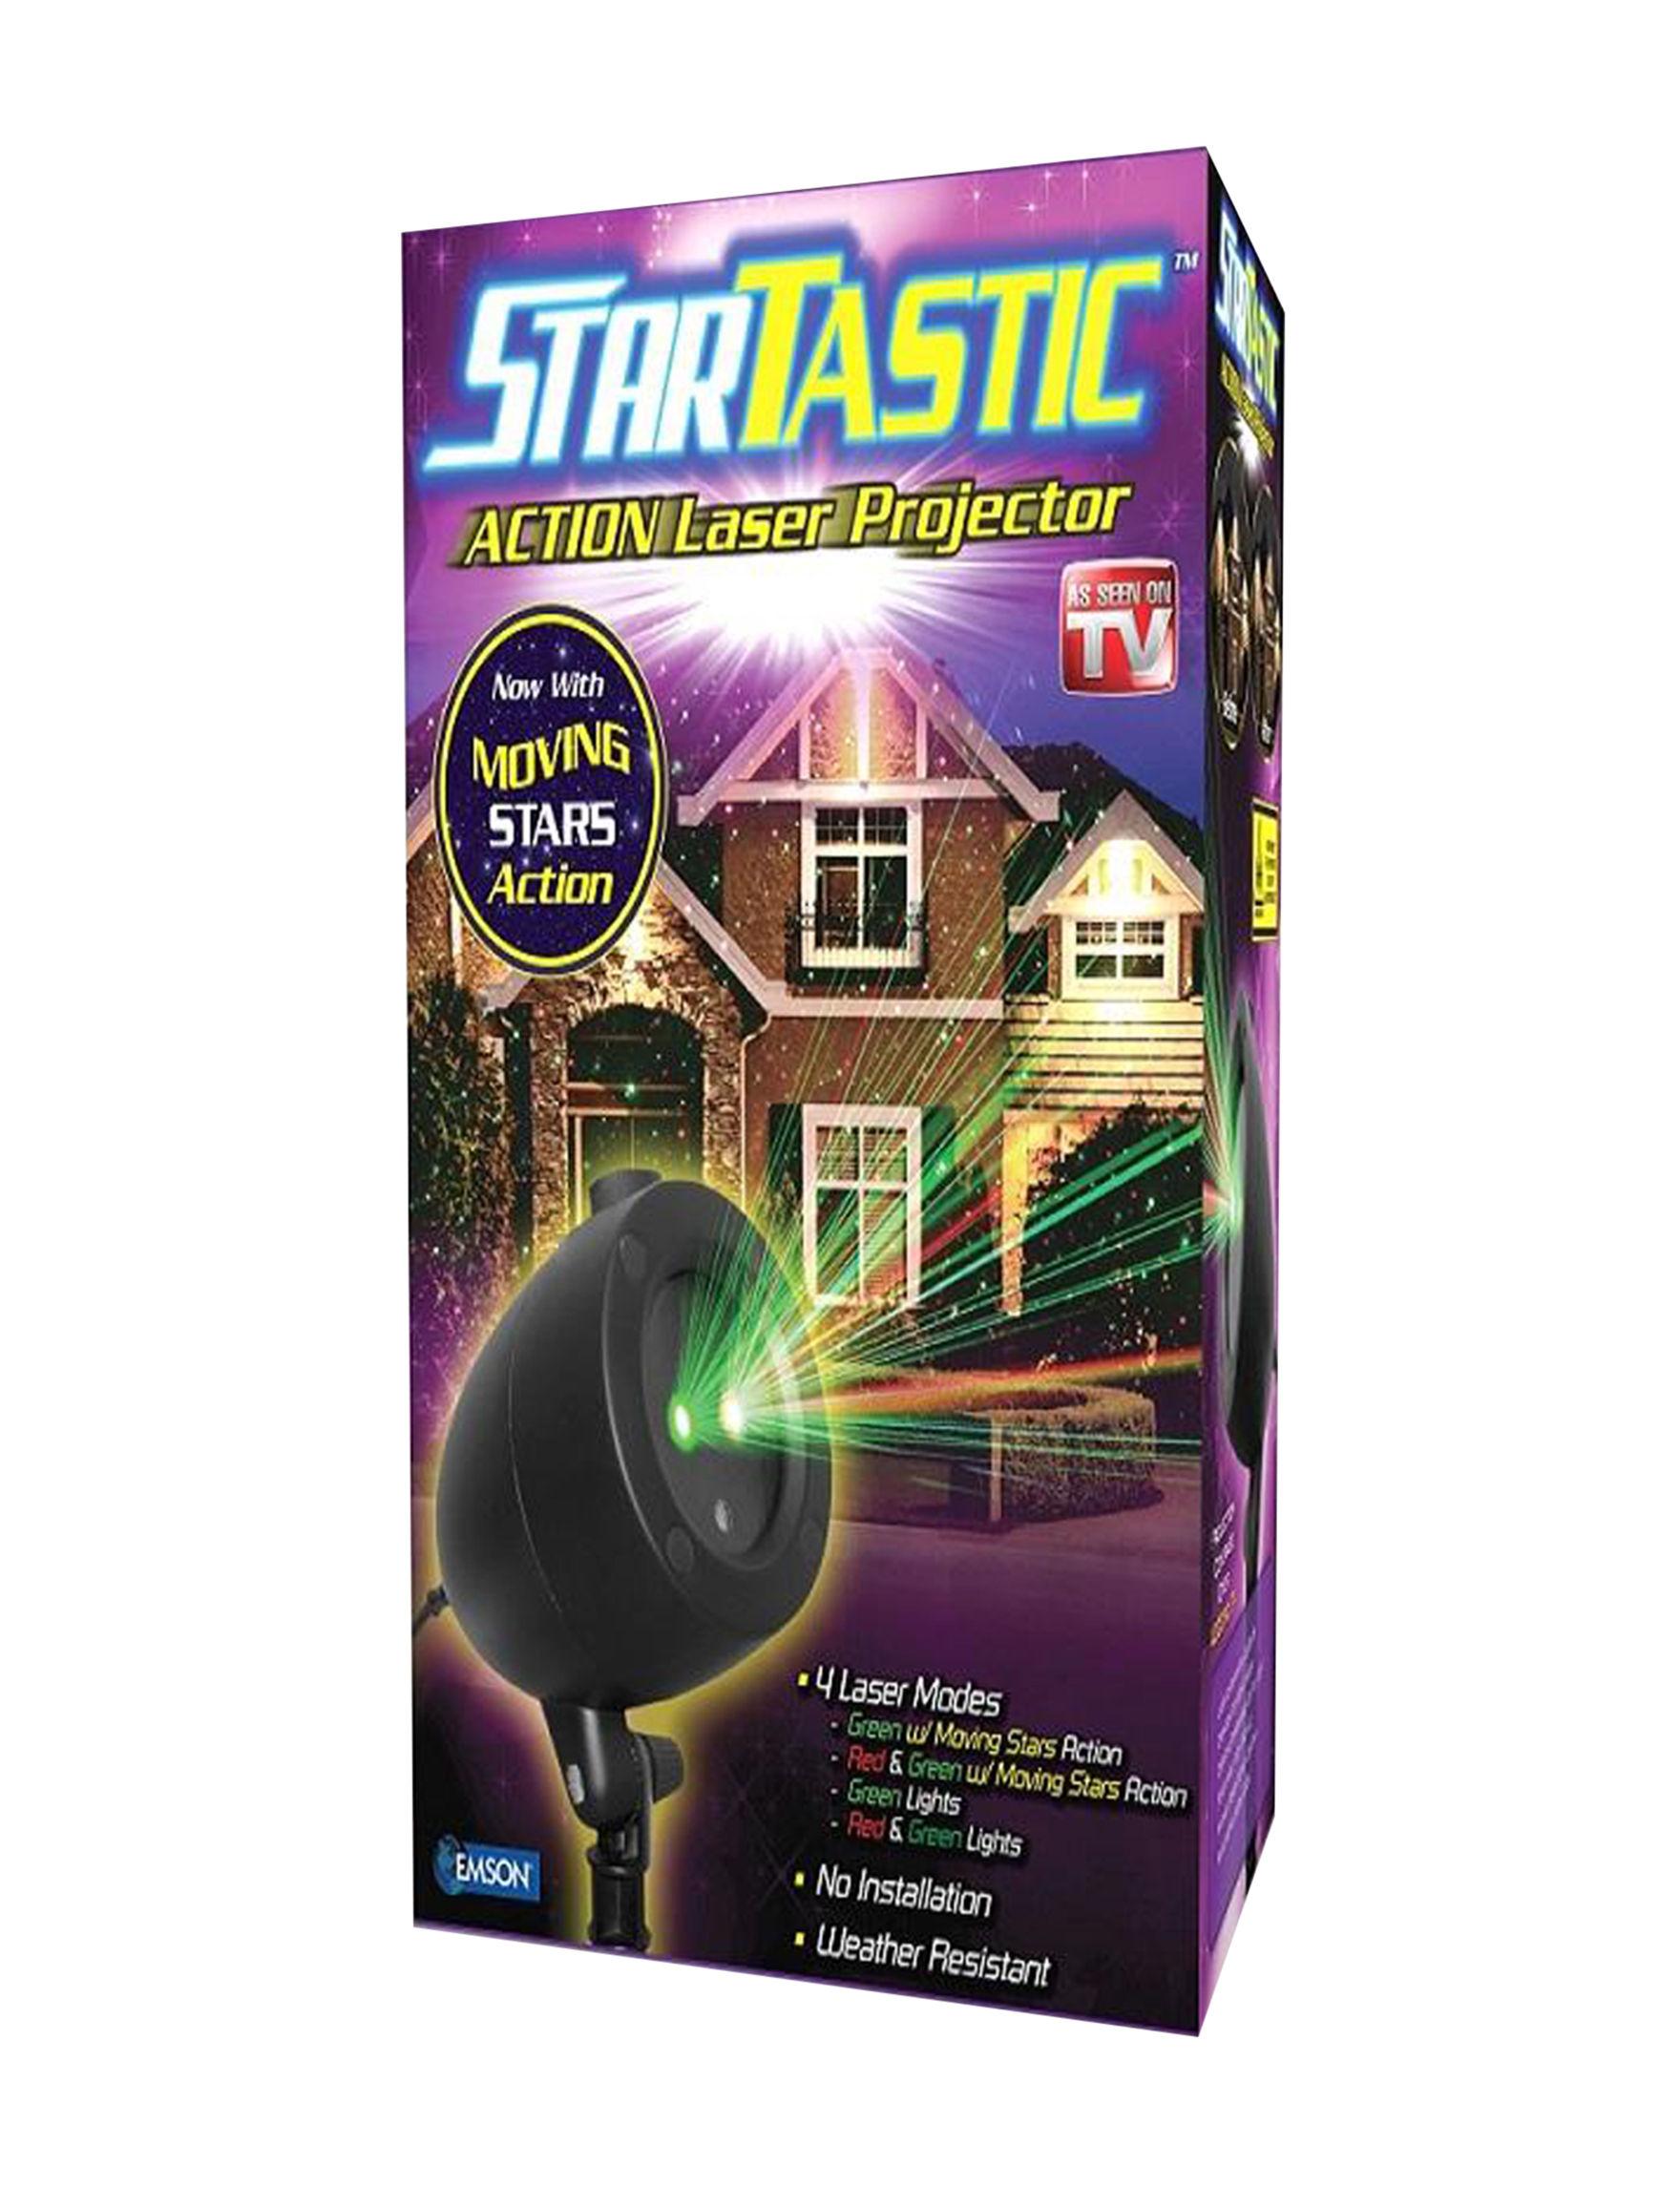 As Seen on TV Black / Multi Lights & Lanterns Outdoor Holiday Decor Holiday Decor Outdoor Decor